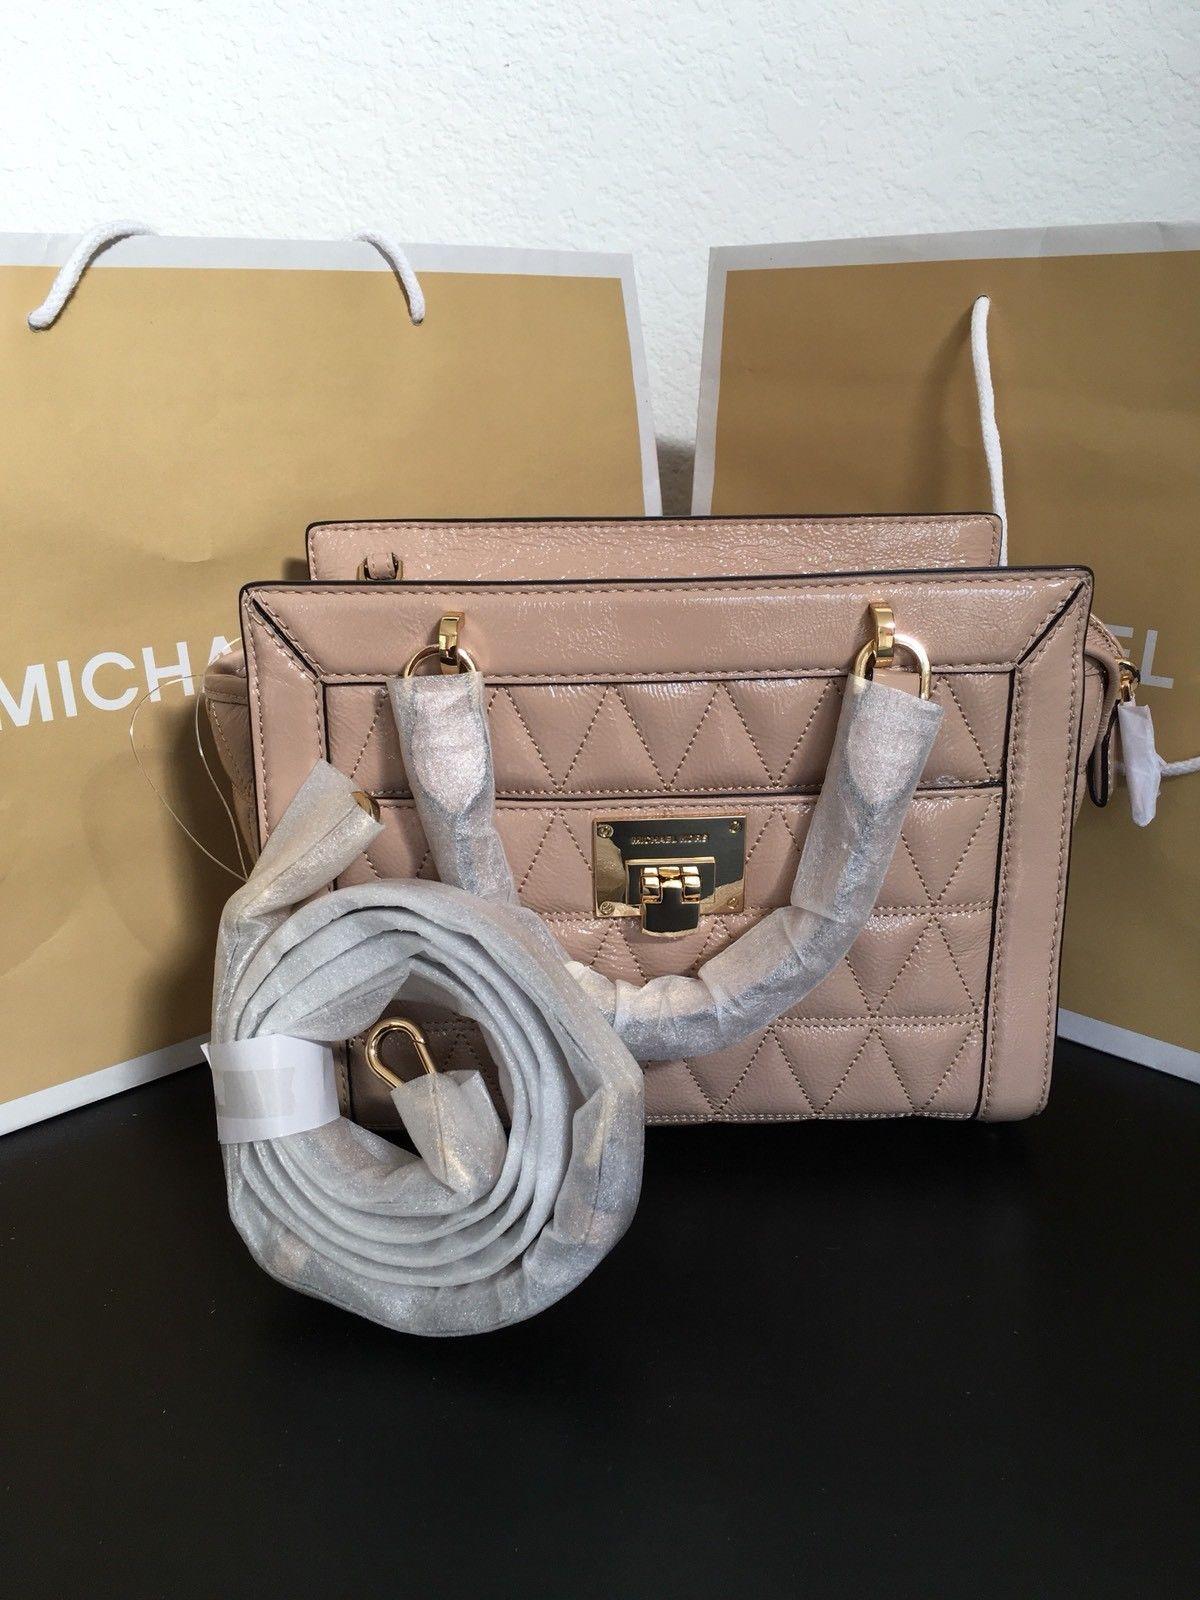 4ec63cea5a7a NWT Michael Kors VIVIANNE Quilted SM TZ Patent Leather Messenger Bag OYSTER   348